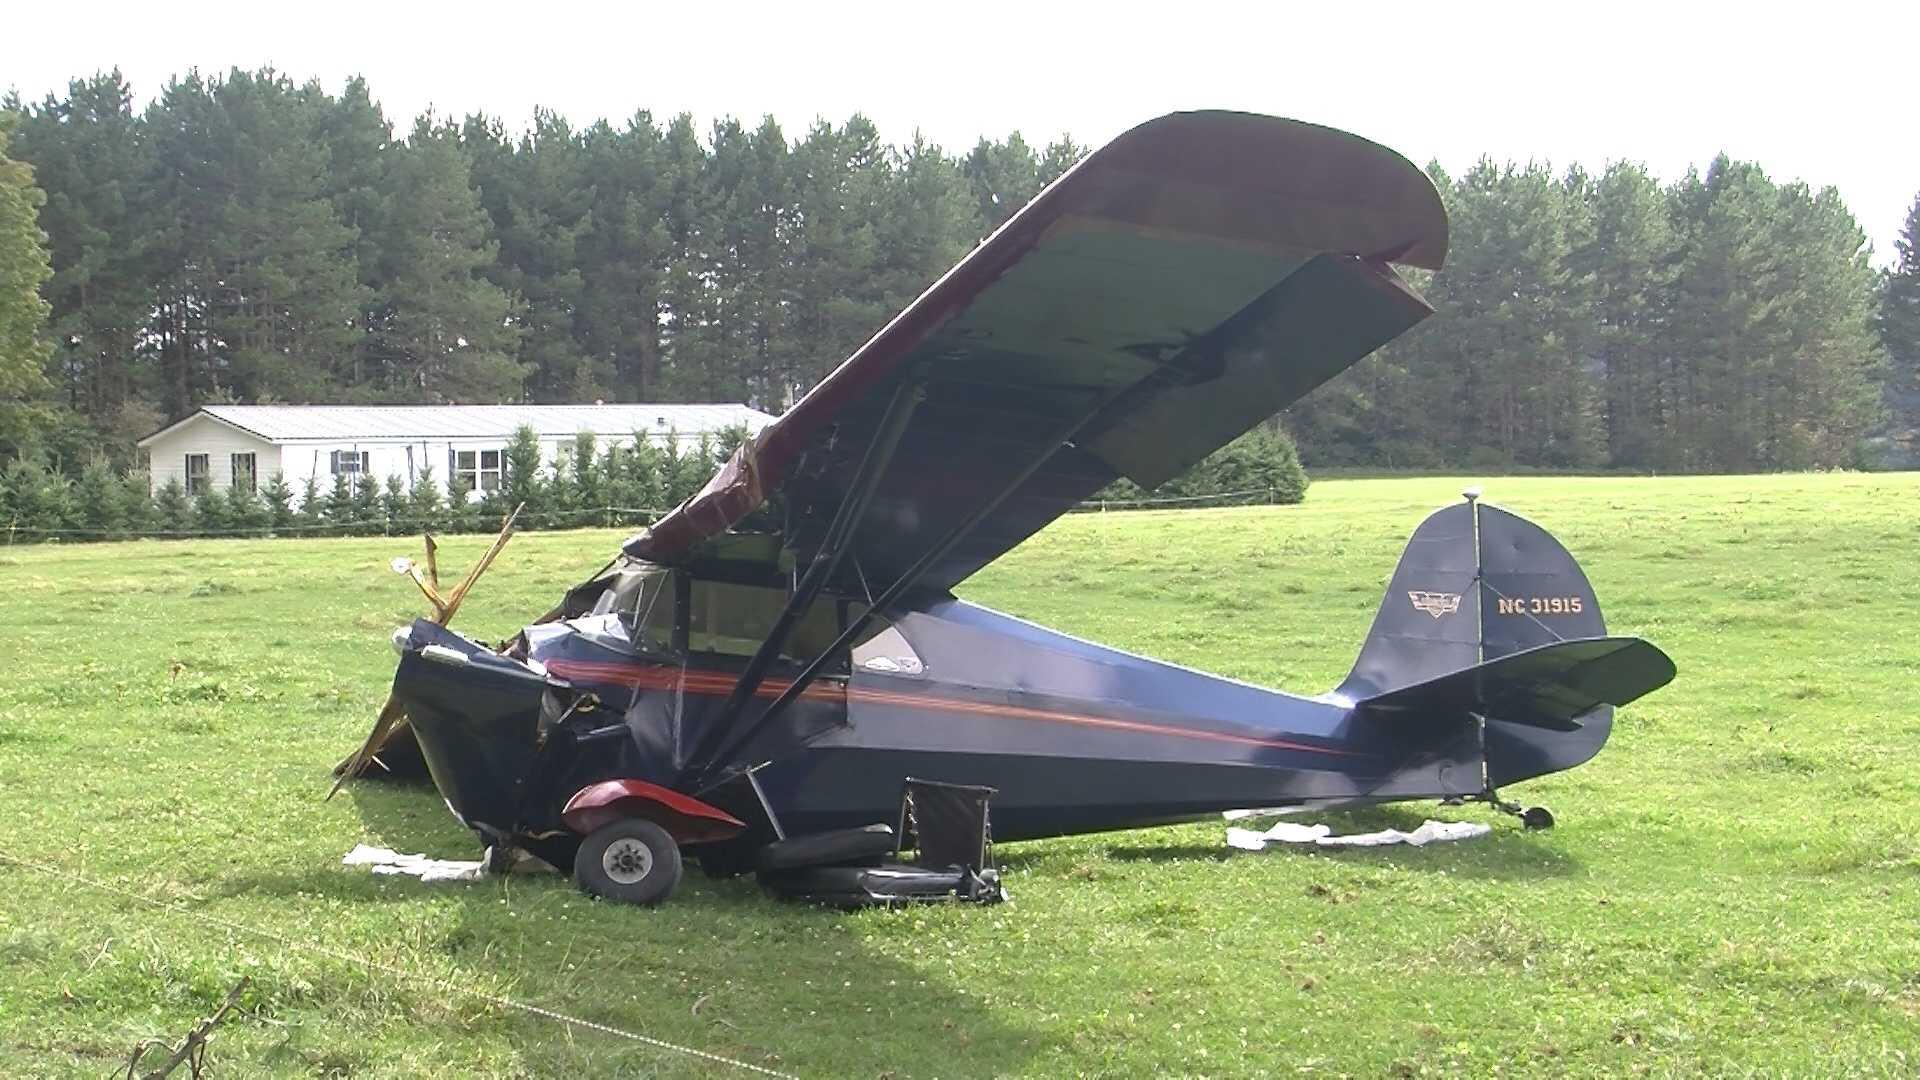 09-01-13 Small plane crashes, 2 hurt - img